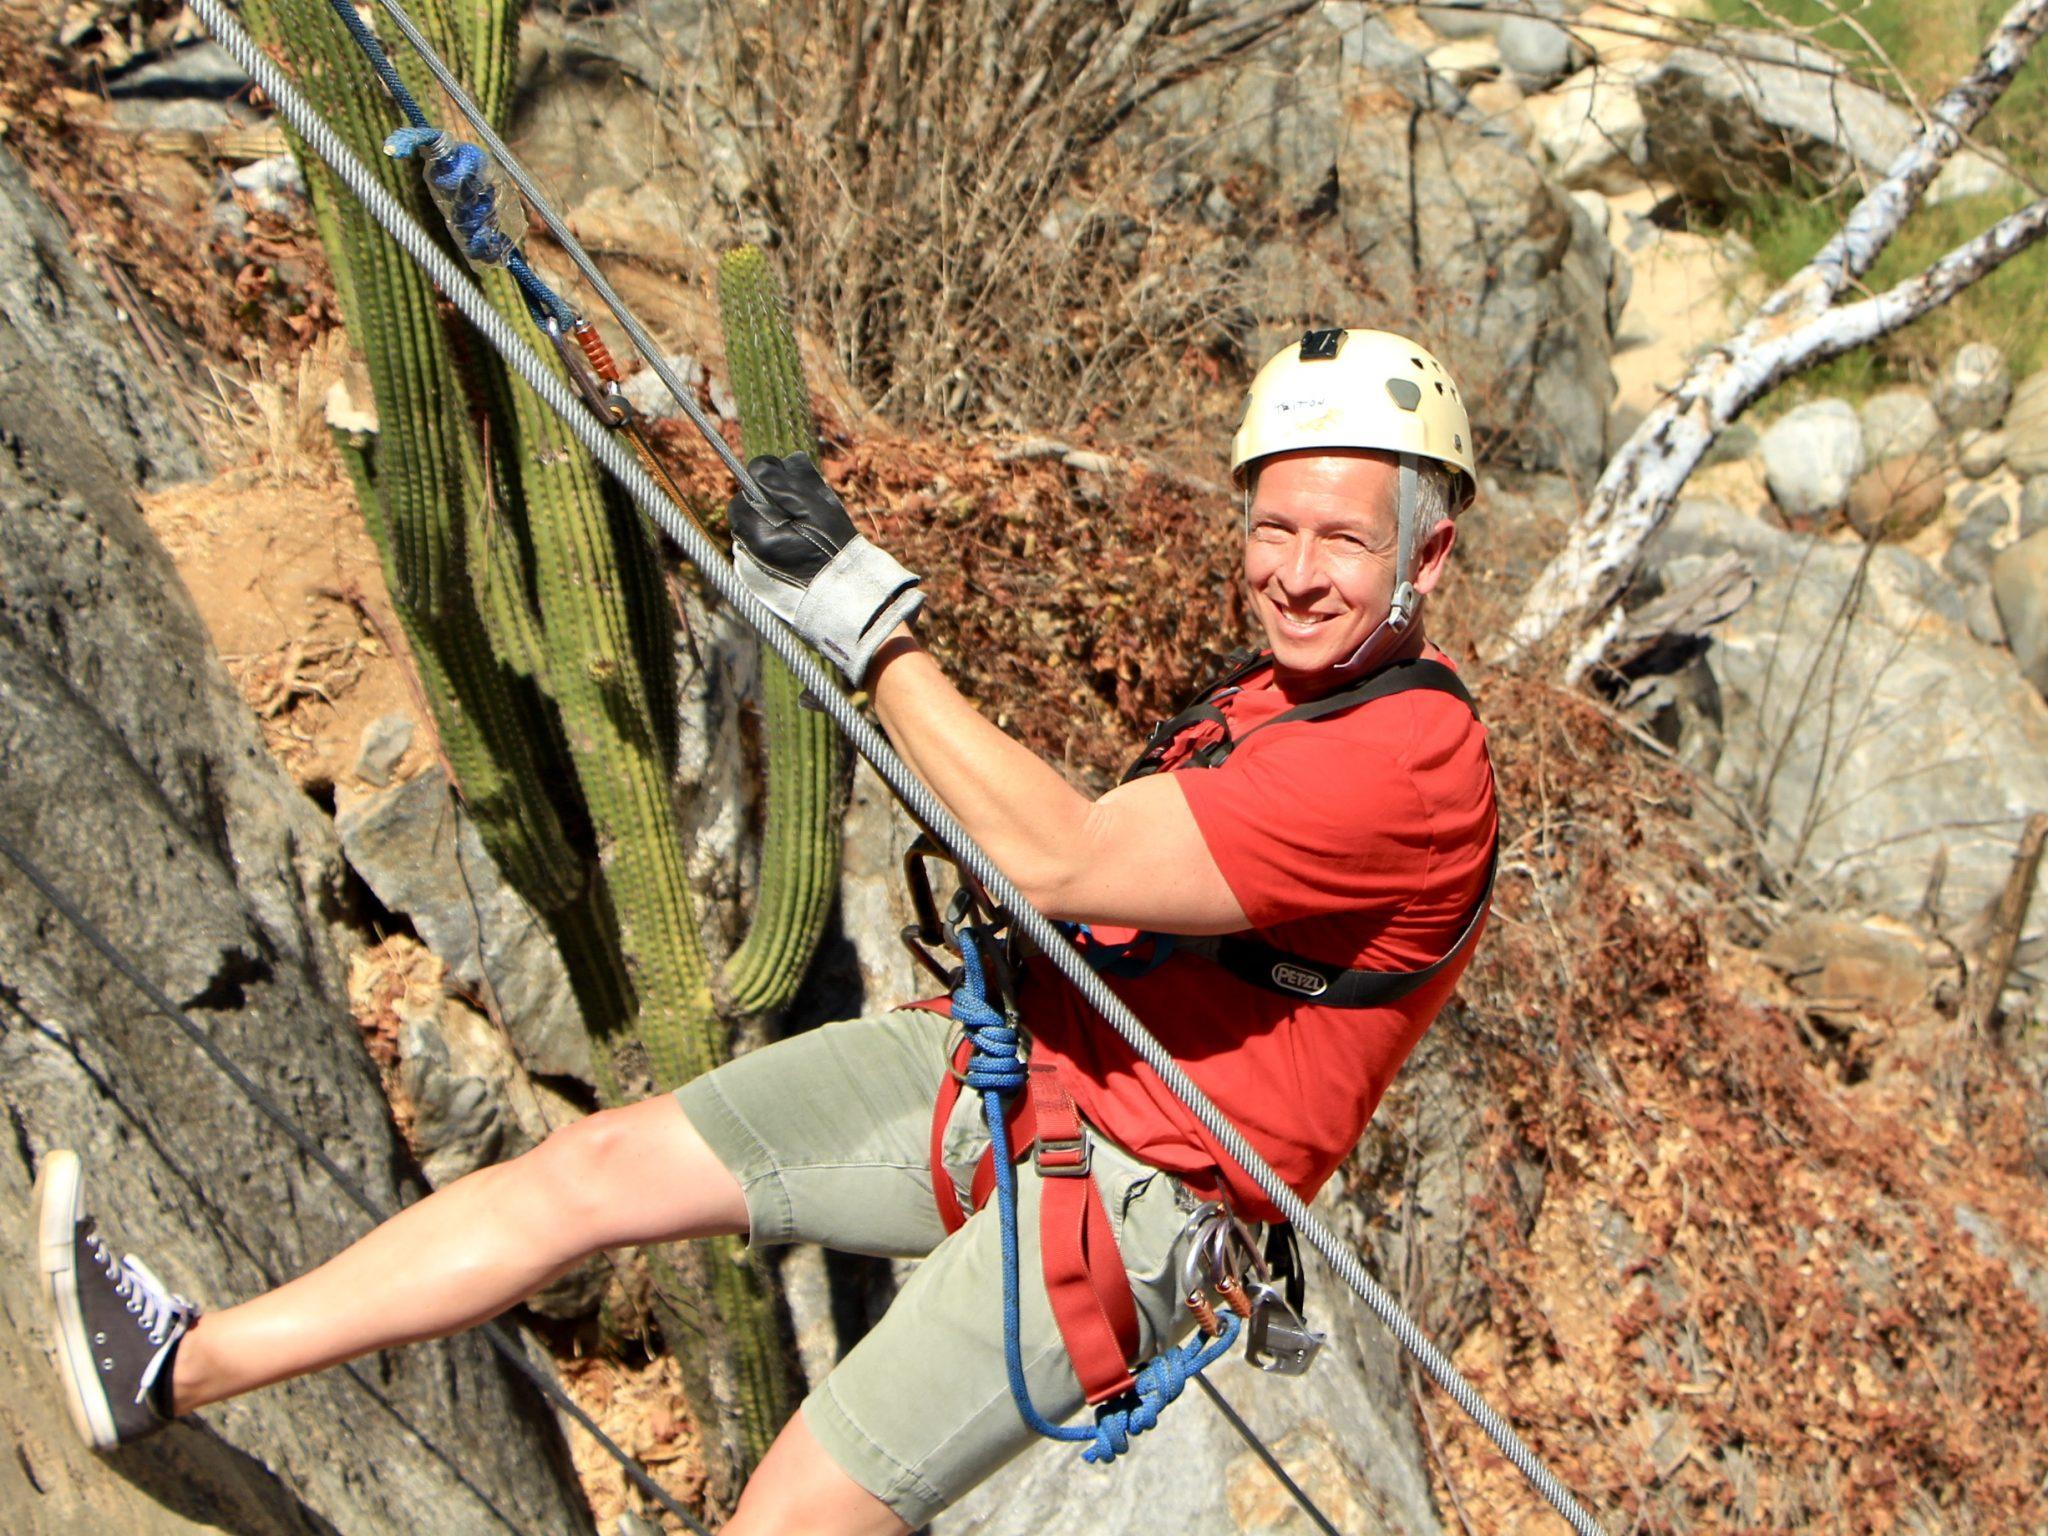 Man rock climbing in gear and helmet with Cabo Adventures in Los Cabos, Mexico